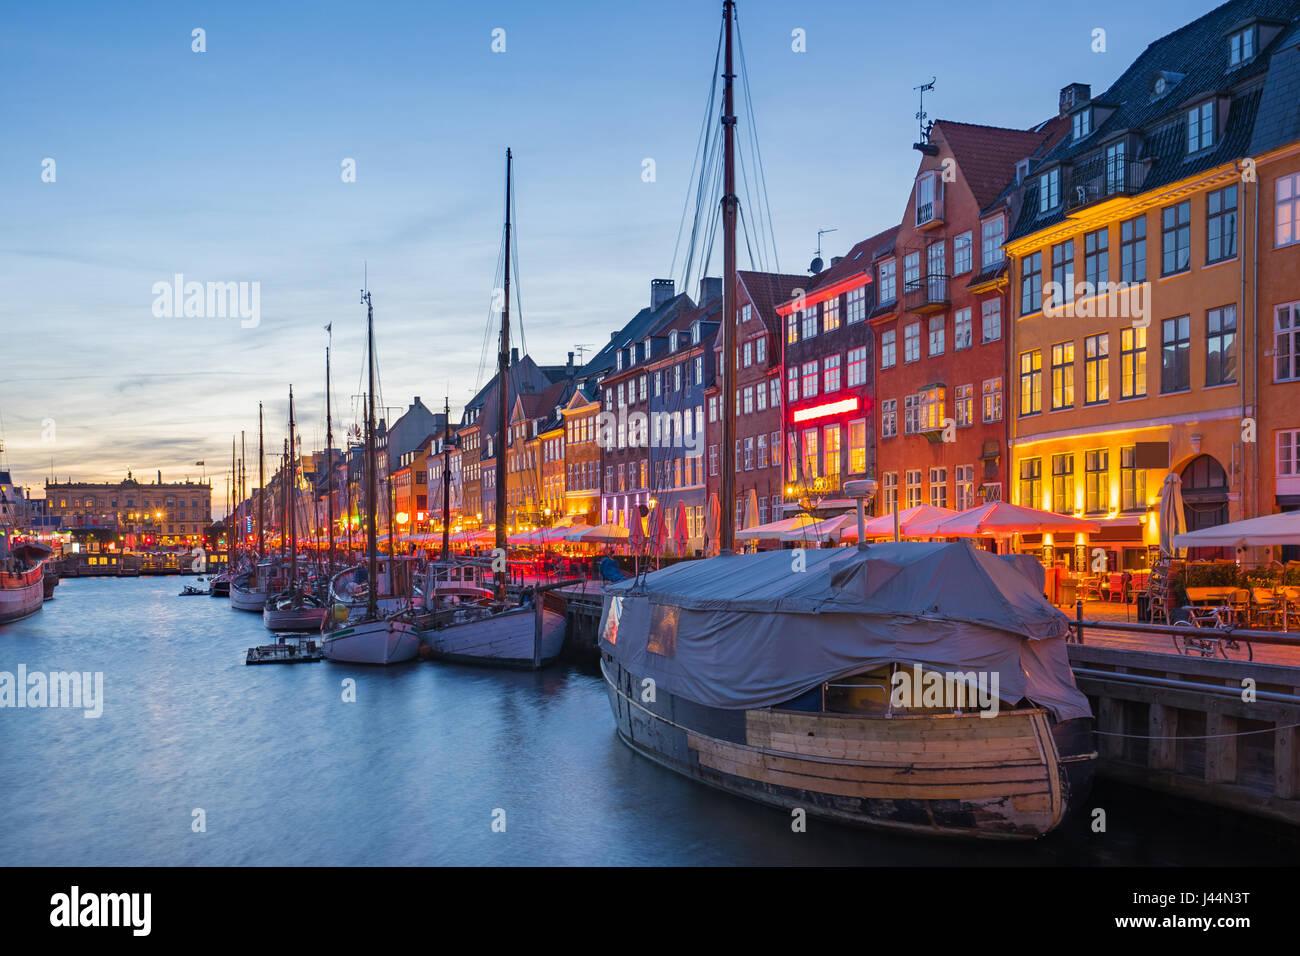 Nyhavn Canal at night in Copenhagen city, Denmark. - Stock Image